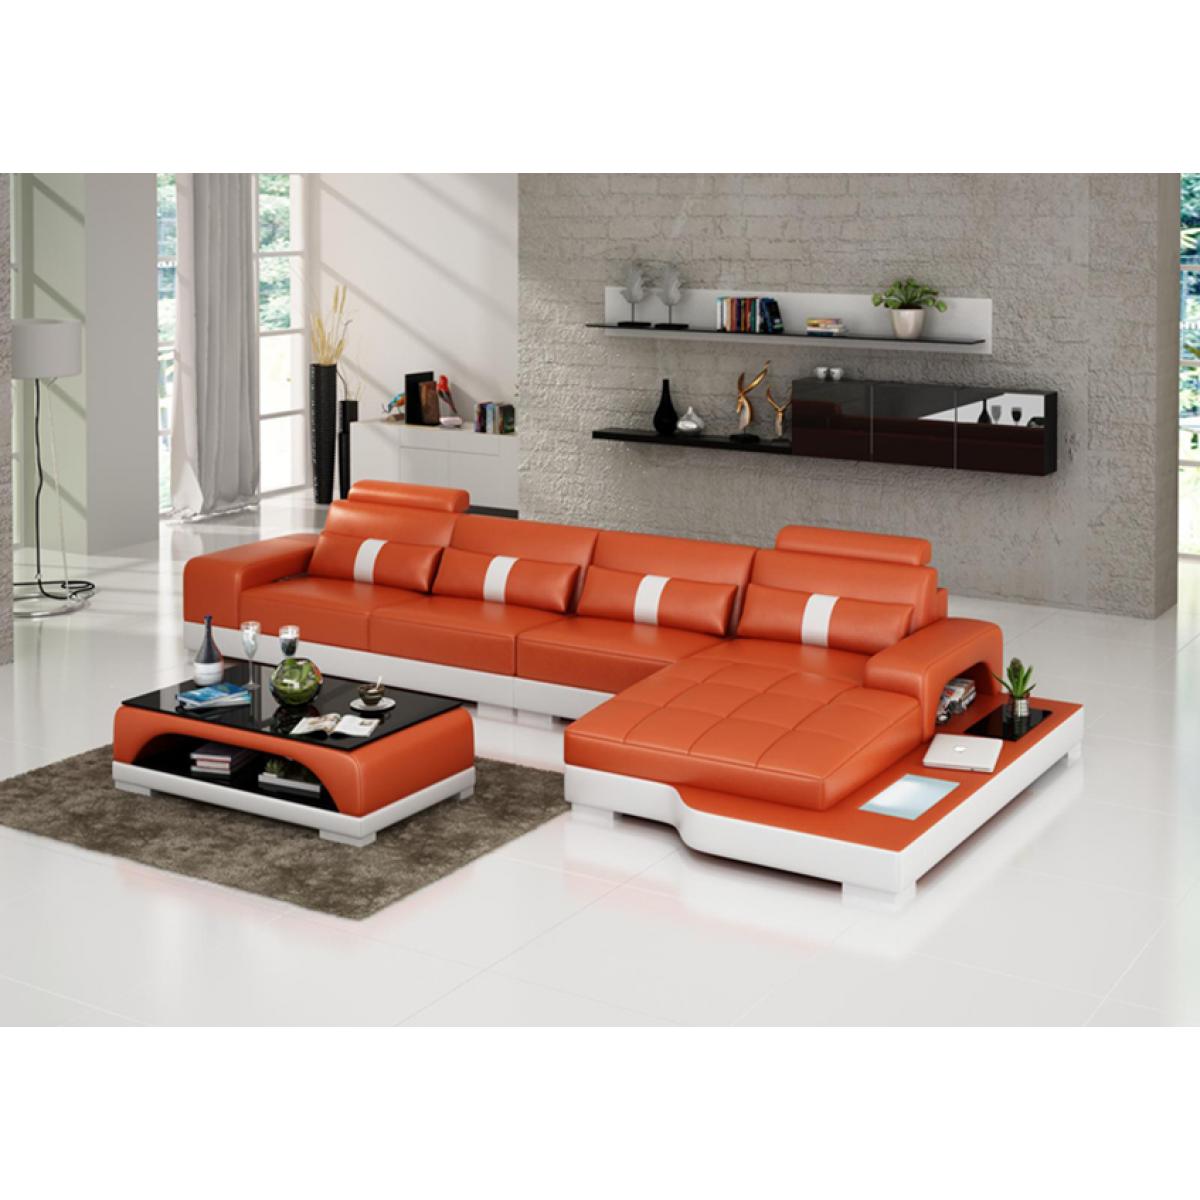 canap d 39 angle en cuir lyon avec clairage pop. Black Bedroom Furniture Sets. Home Design Ideas